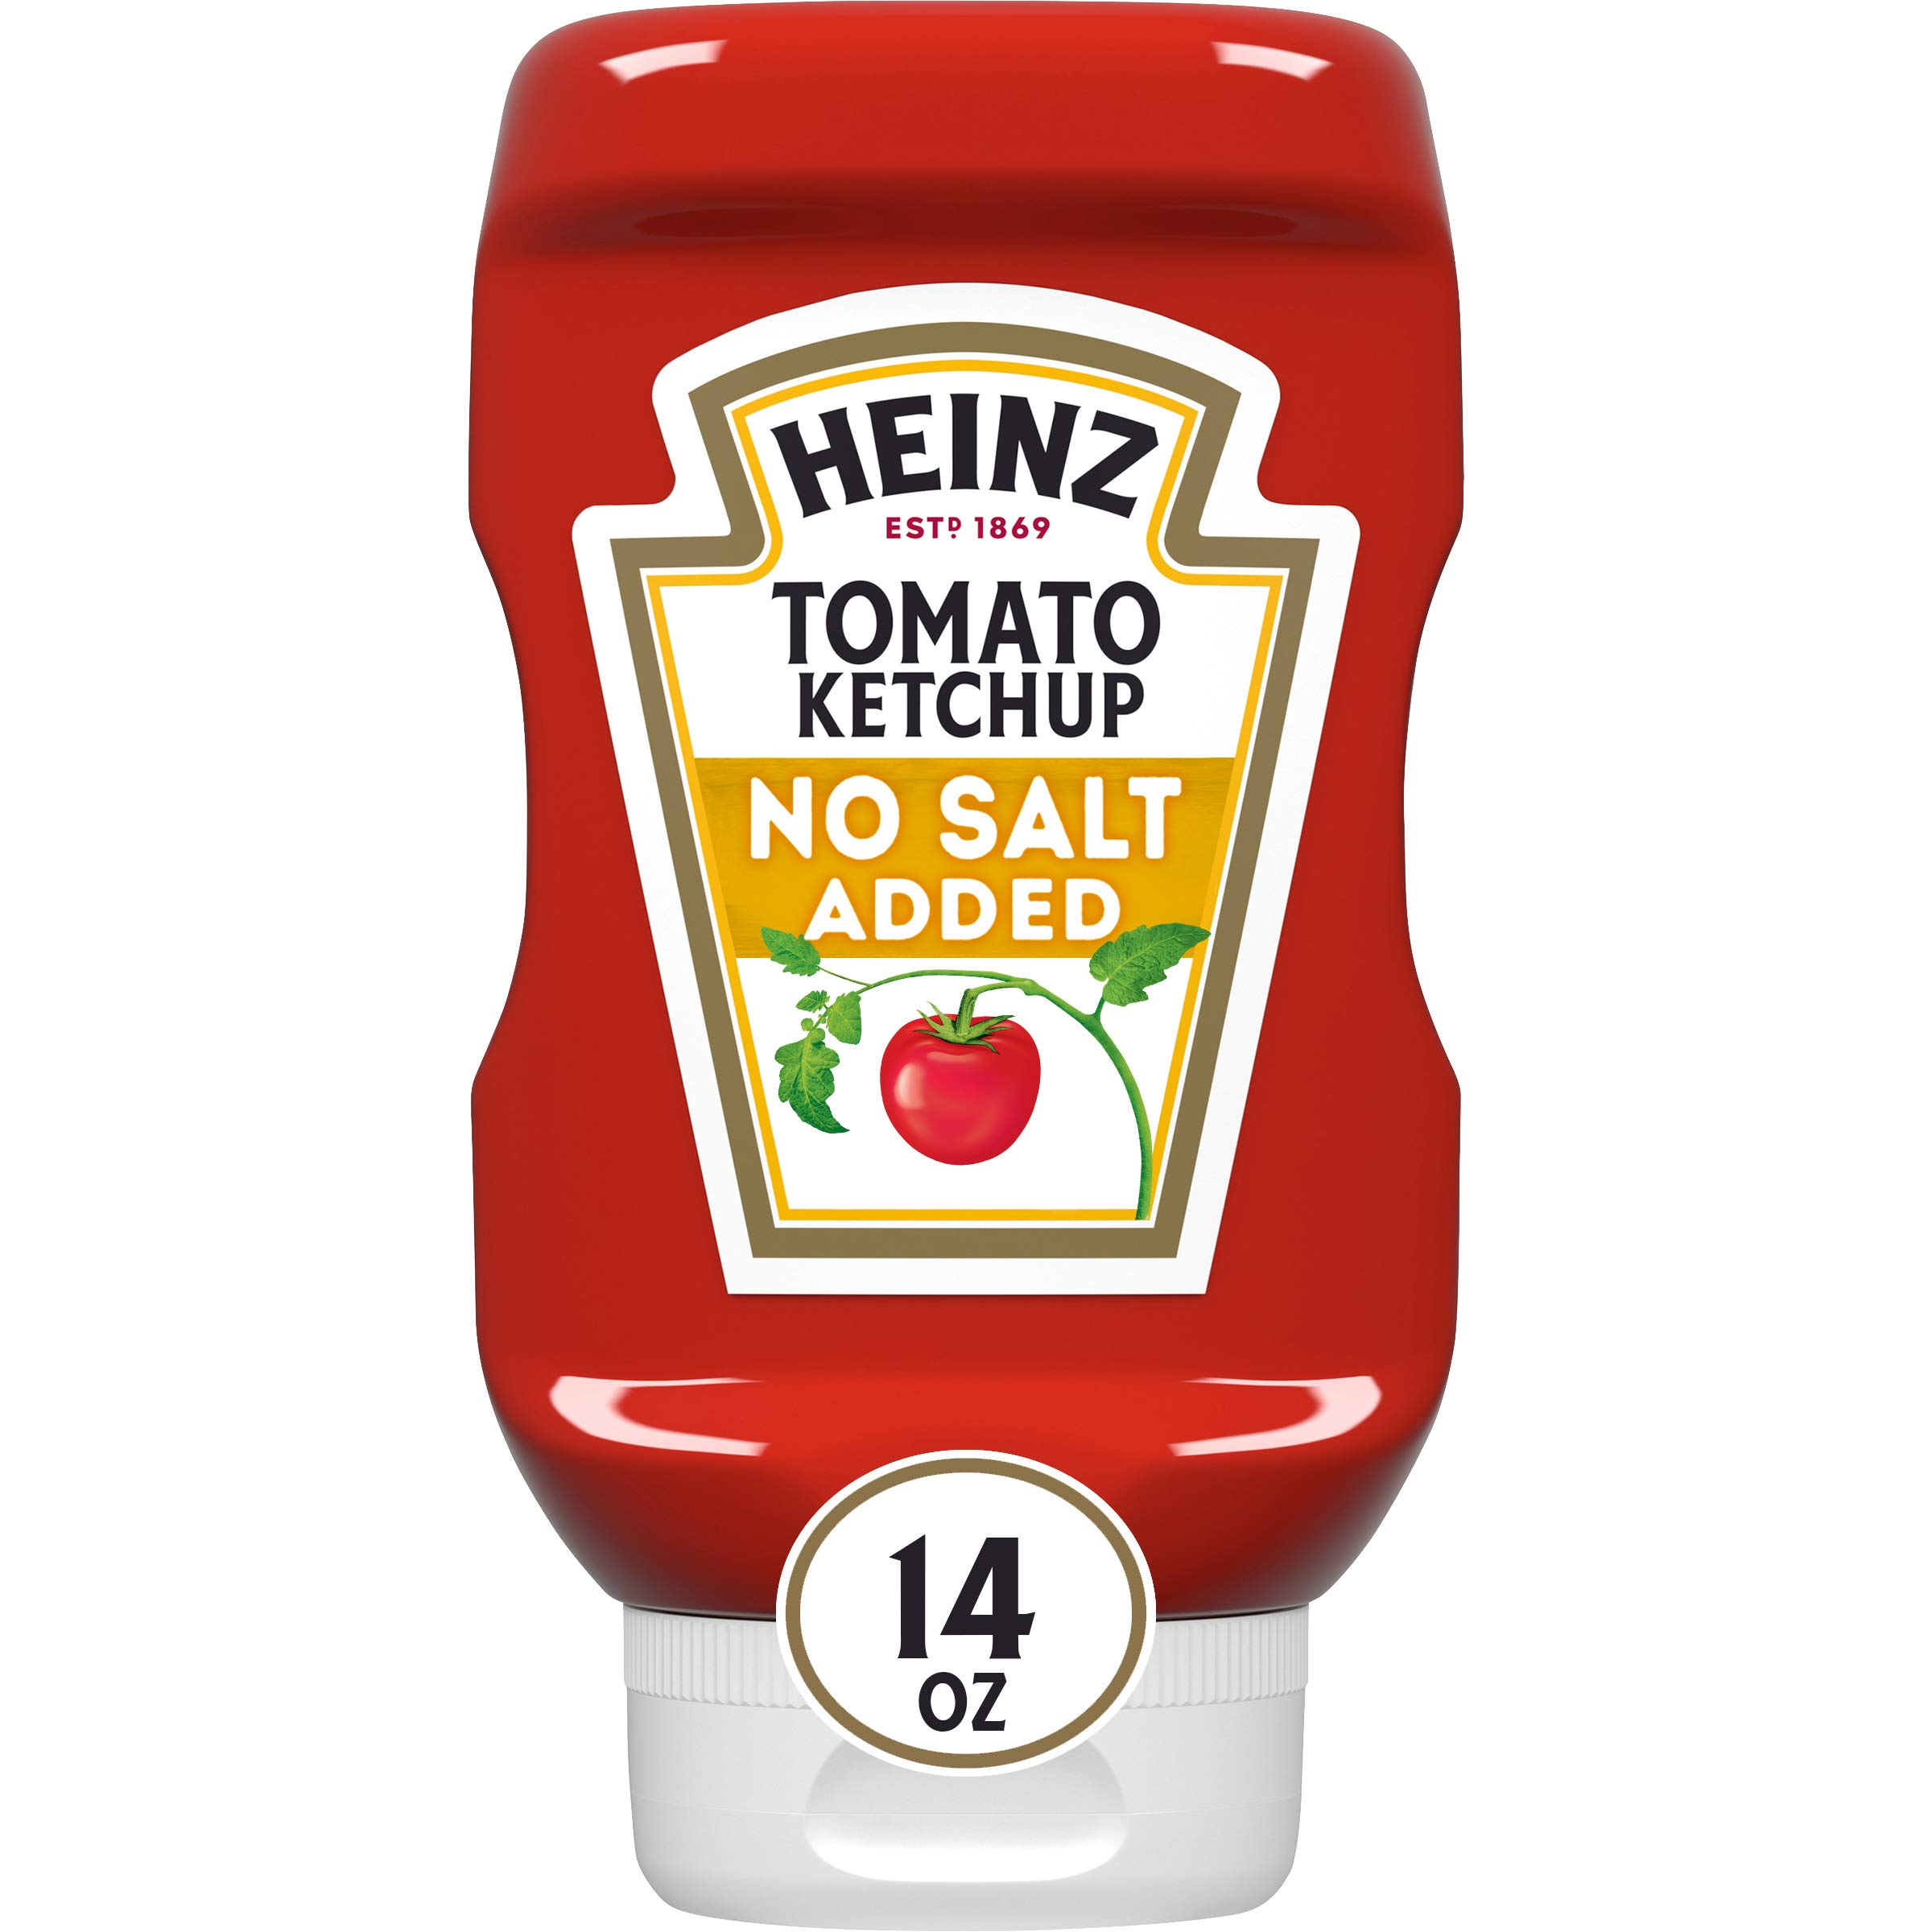 Heinz tomato Ketchup No Added Salt (14oz Bottles, Pack of 6)